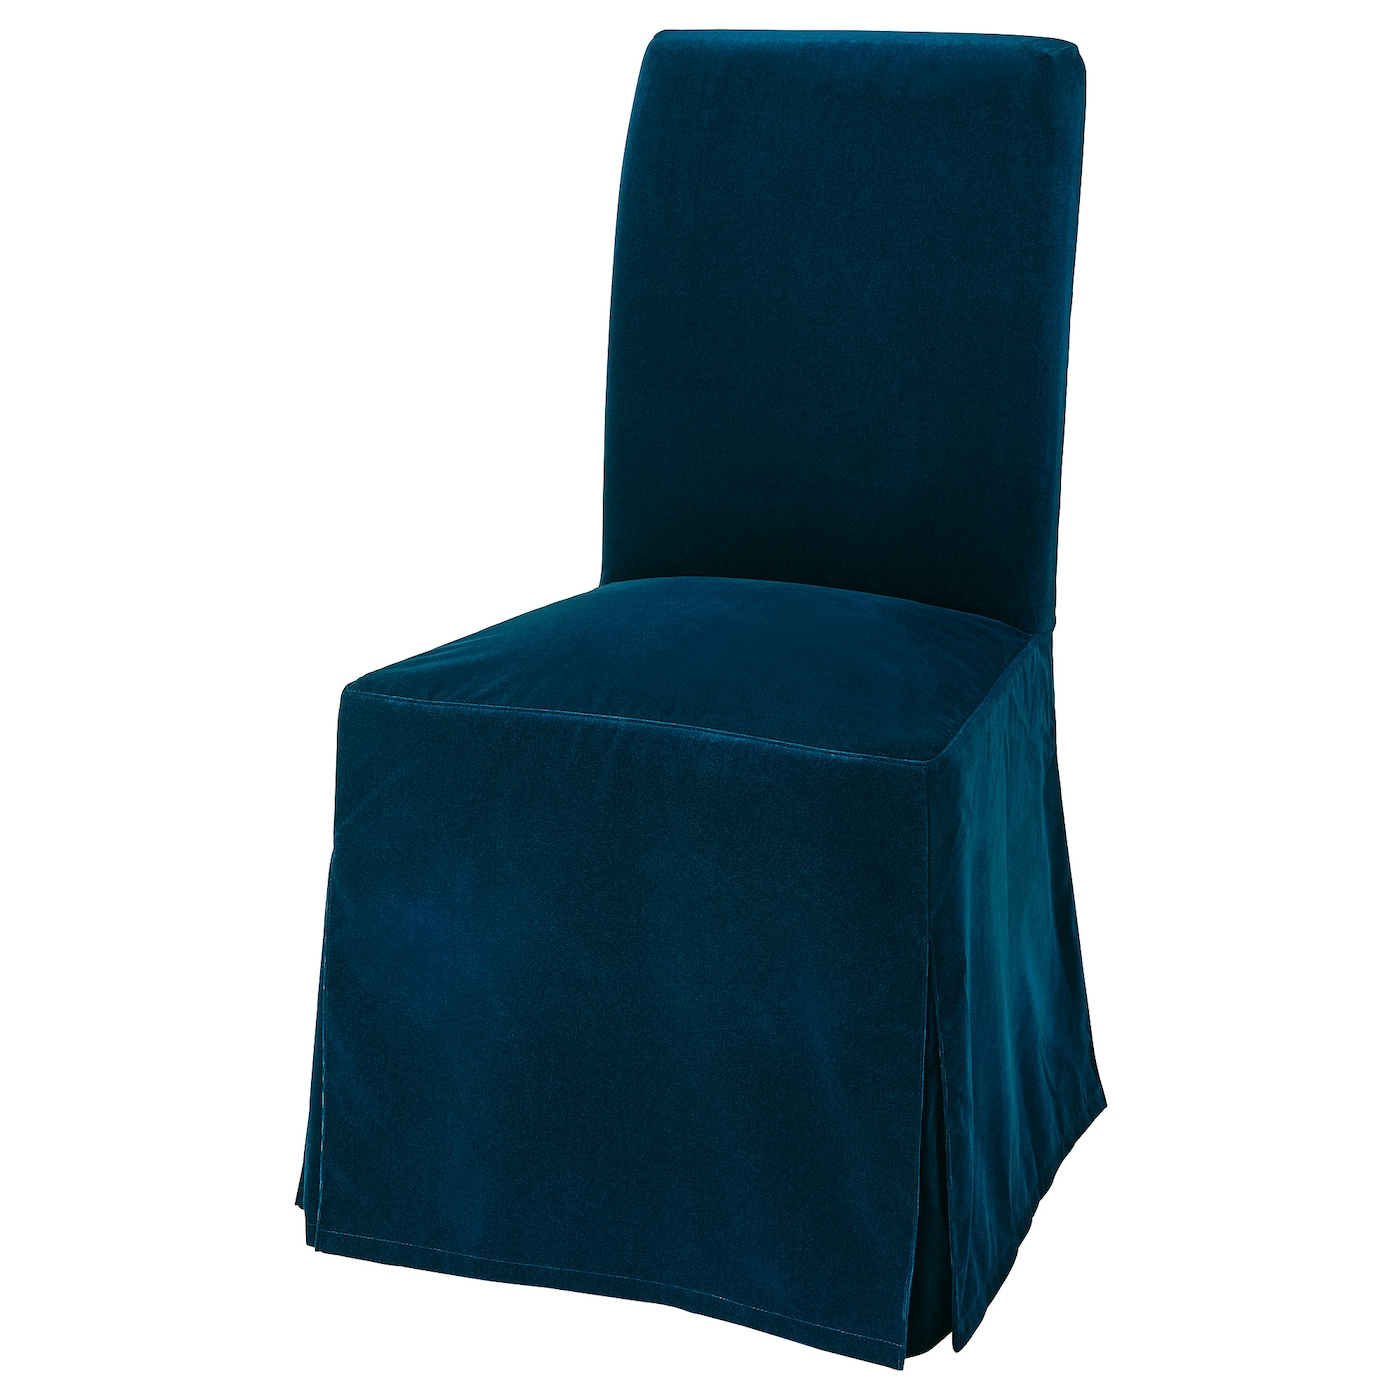 henriksdal chair dark brown djuparp dark greenblue